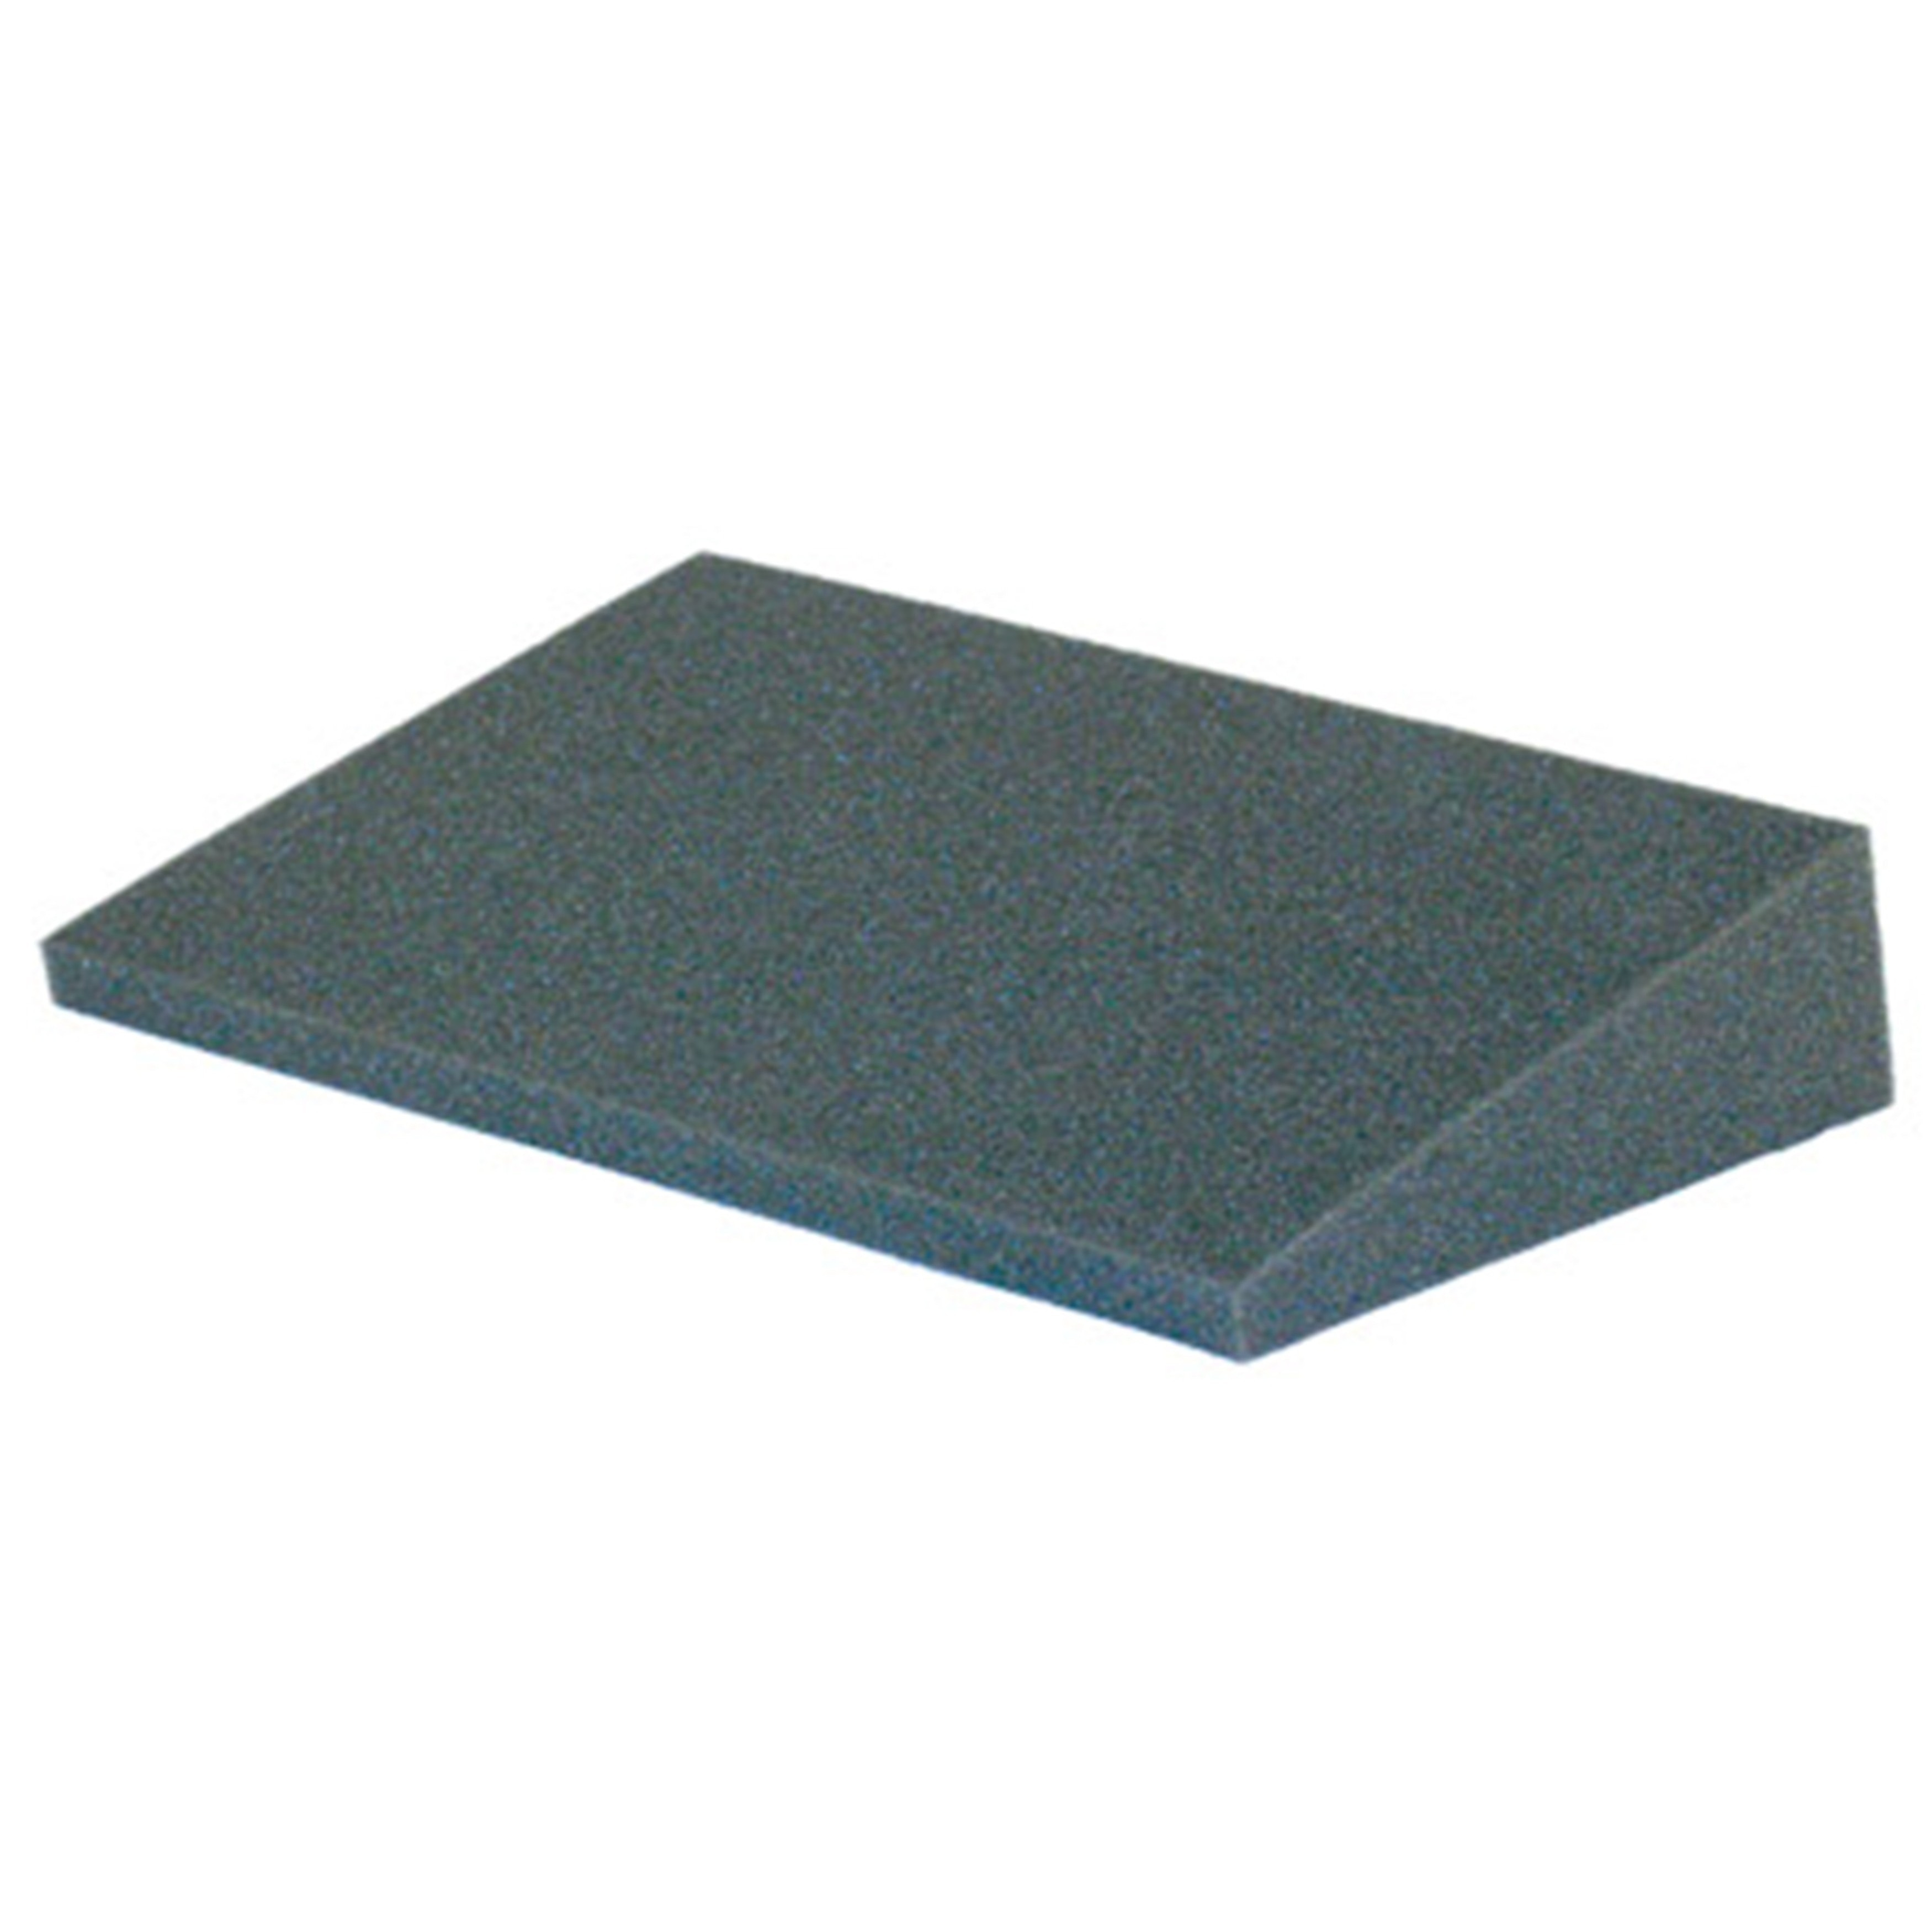 Stress Wedge Cushion For Tailbone Pain